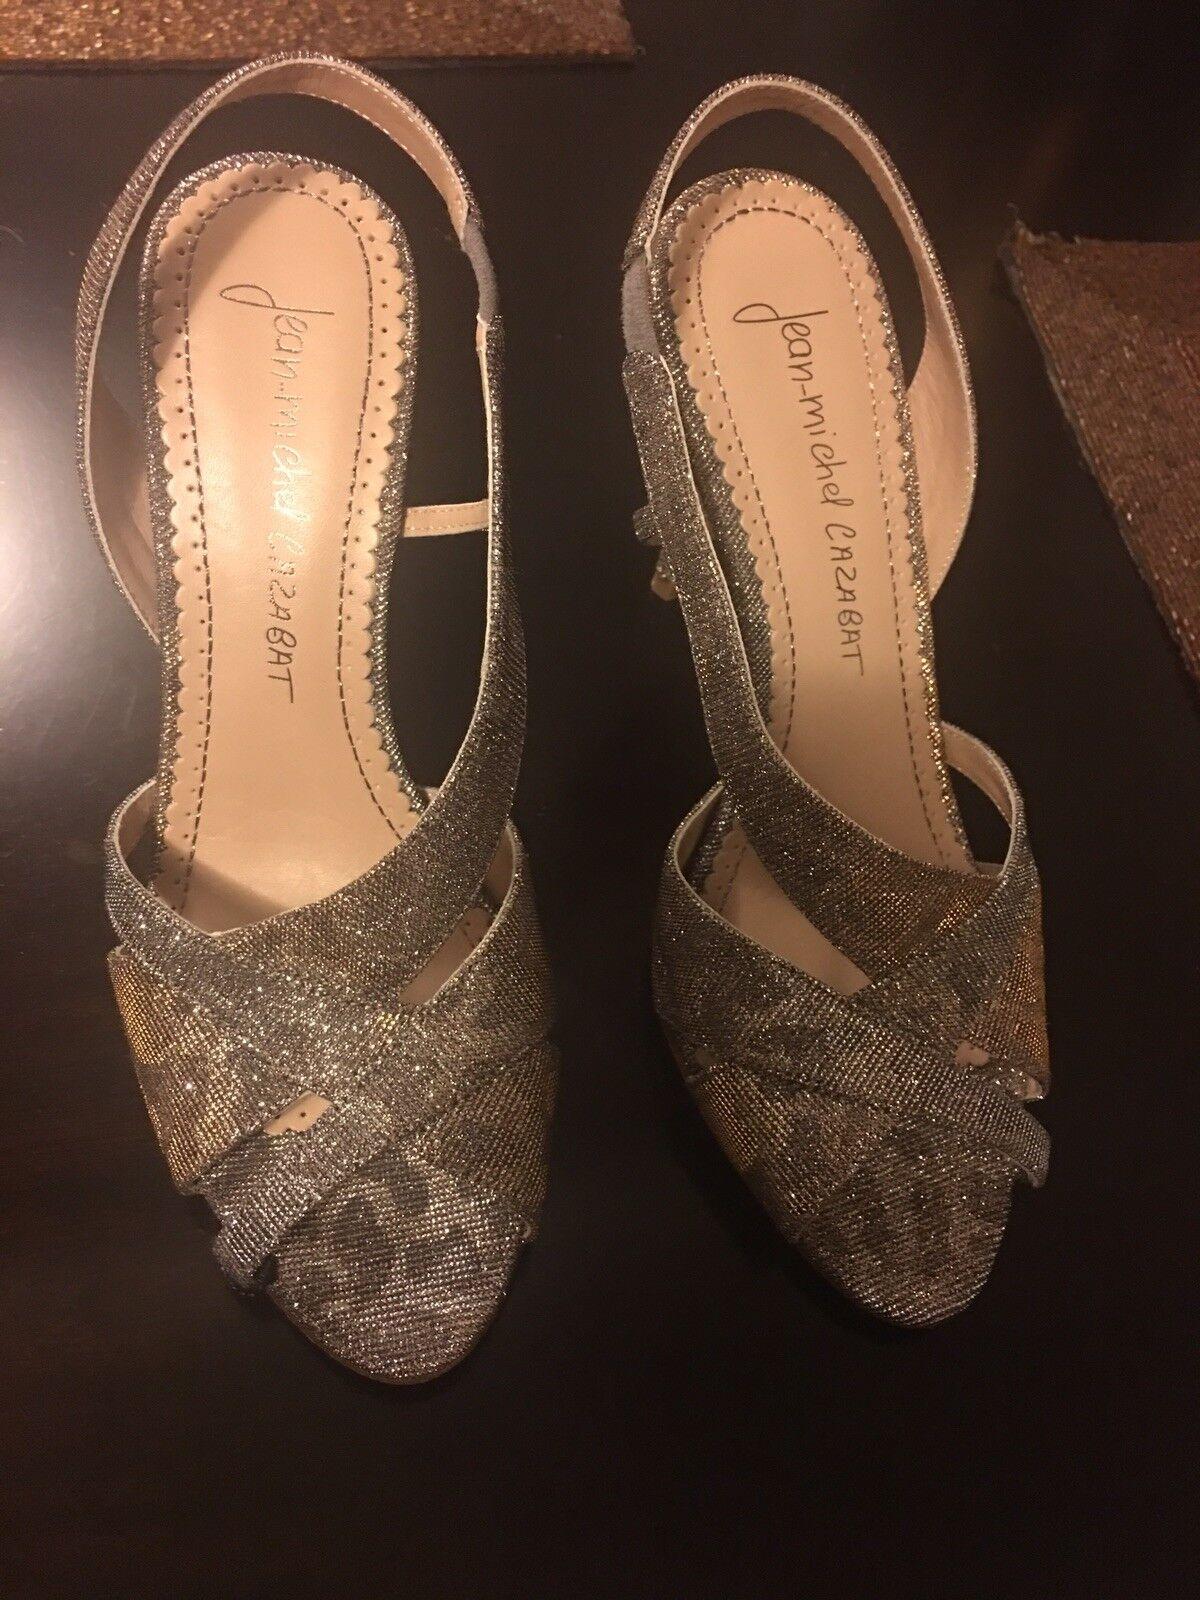 Jean michel cazabat chaussures Taille 38